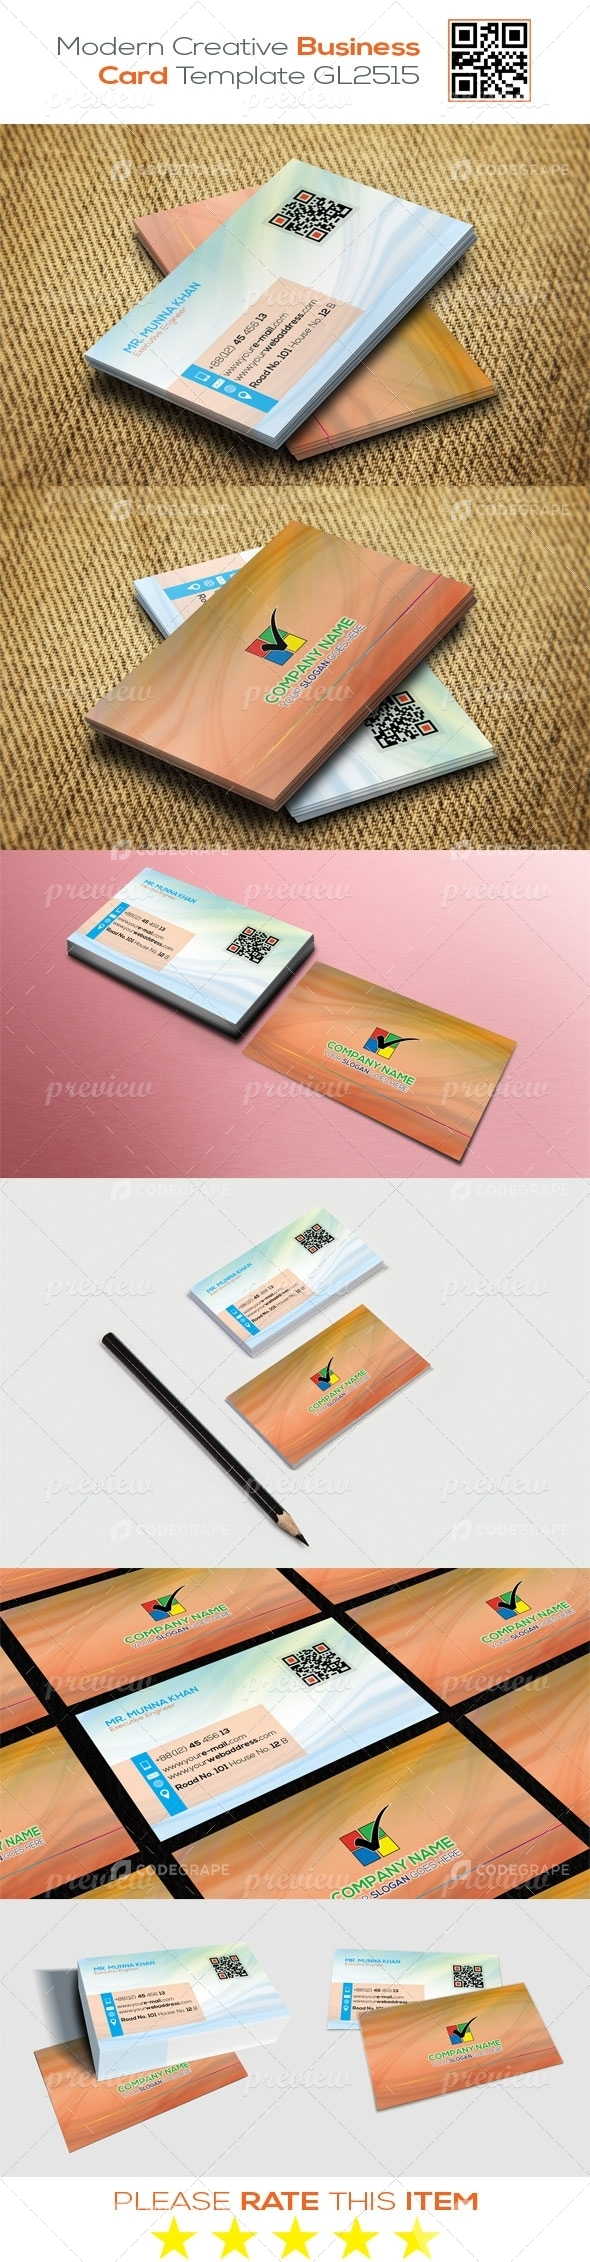 Modern Creative Business Card Template GL2515